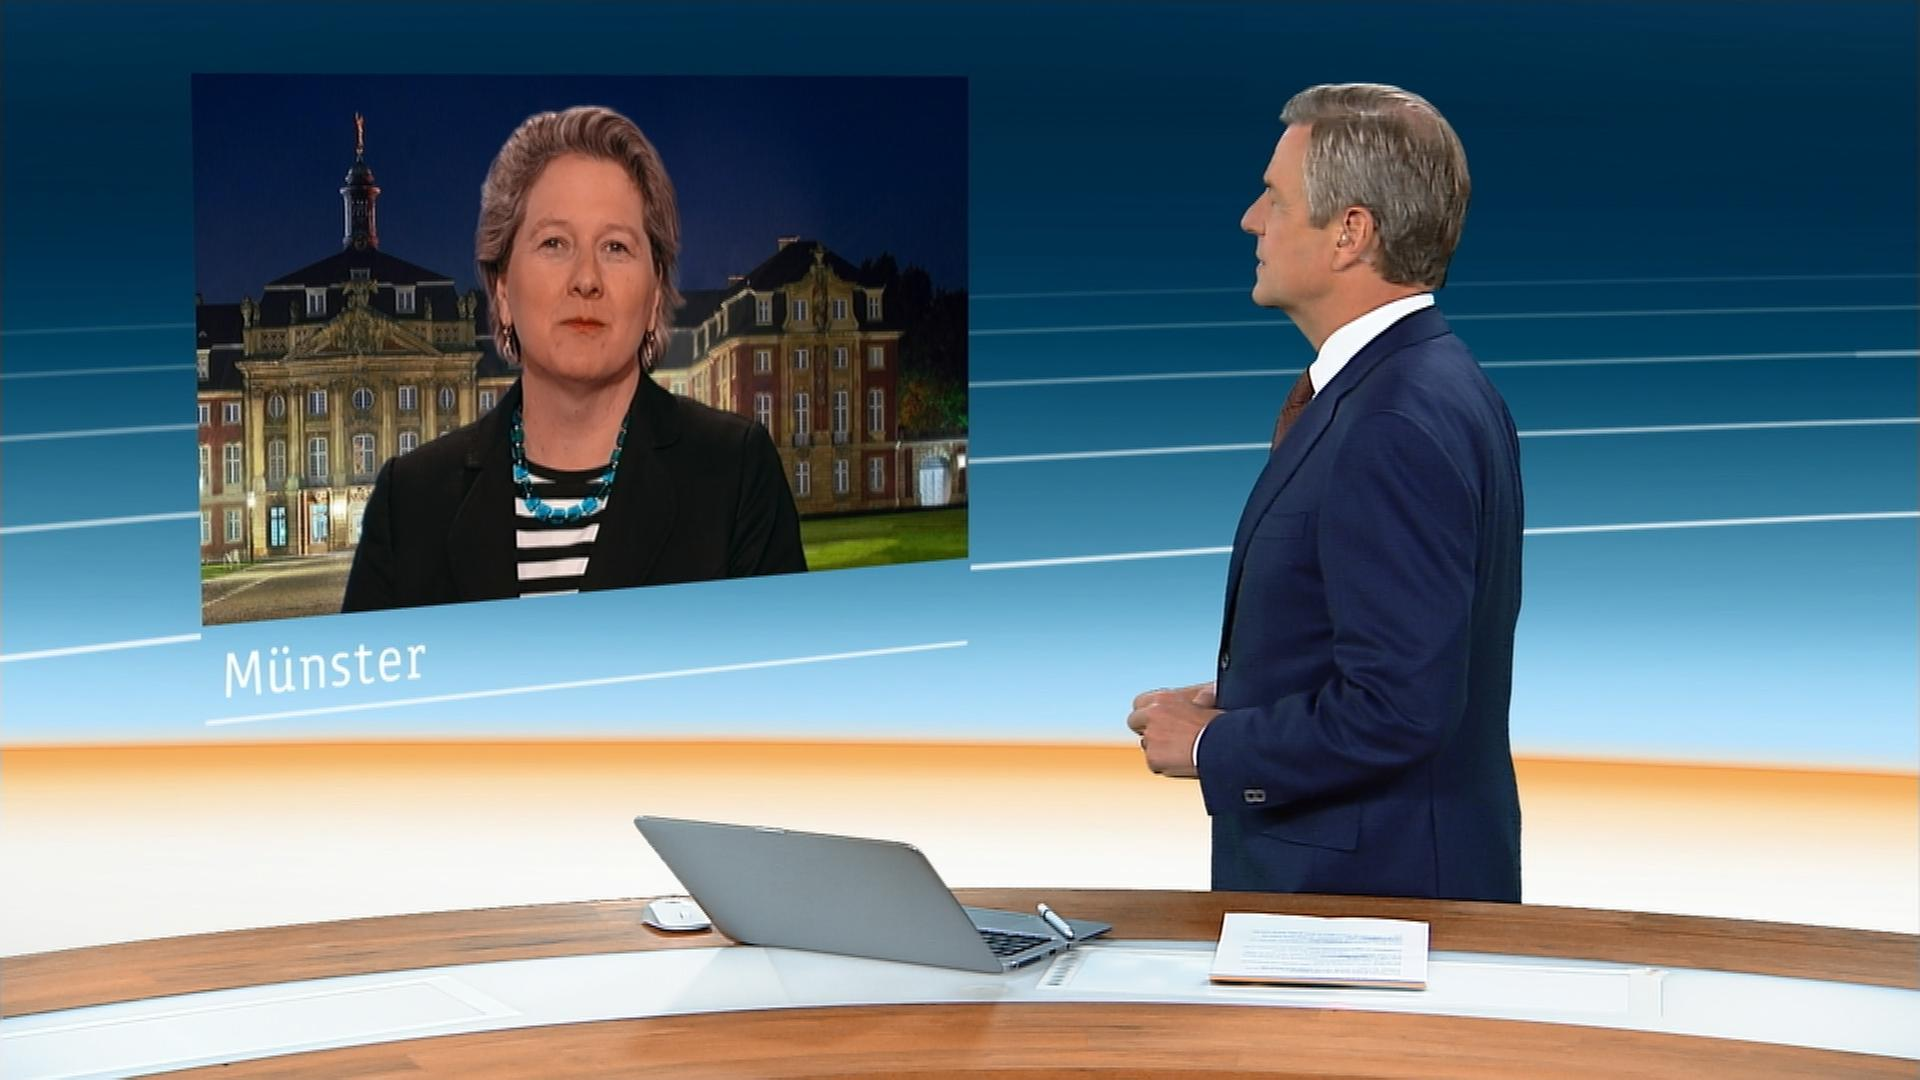 sgs umweltministerin svenja schulze - Christian Sievers Lebenslauf